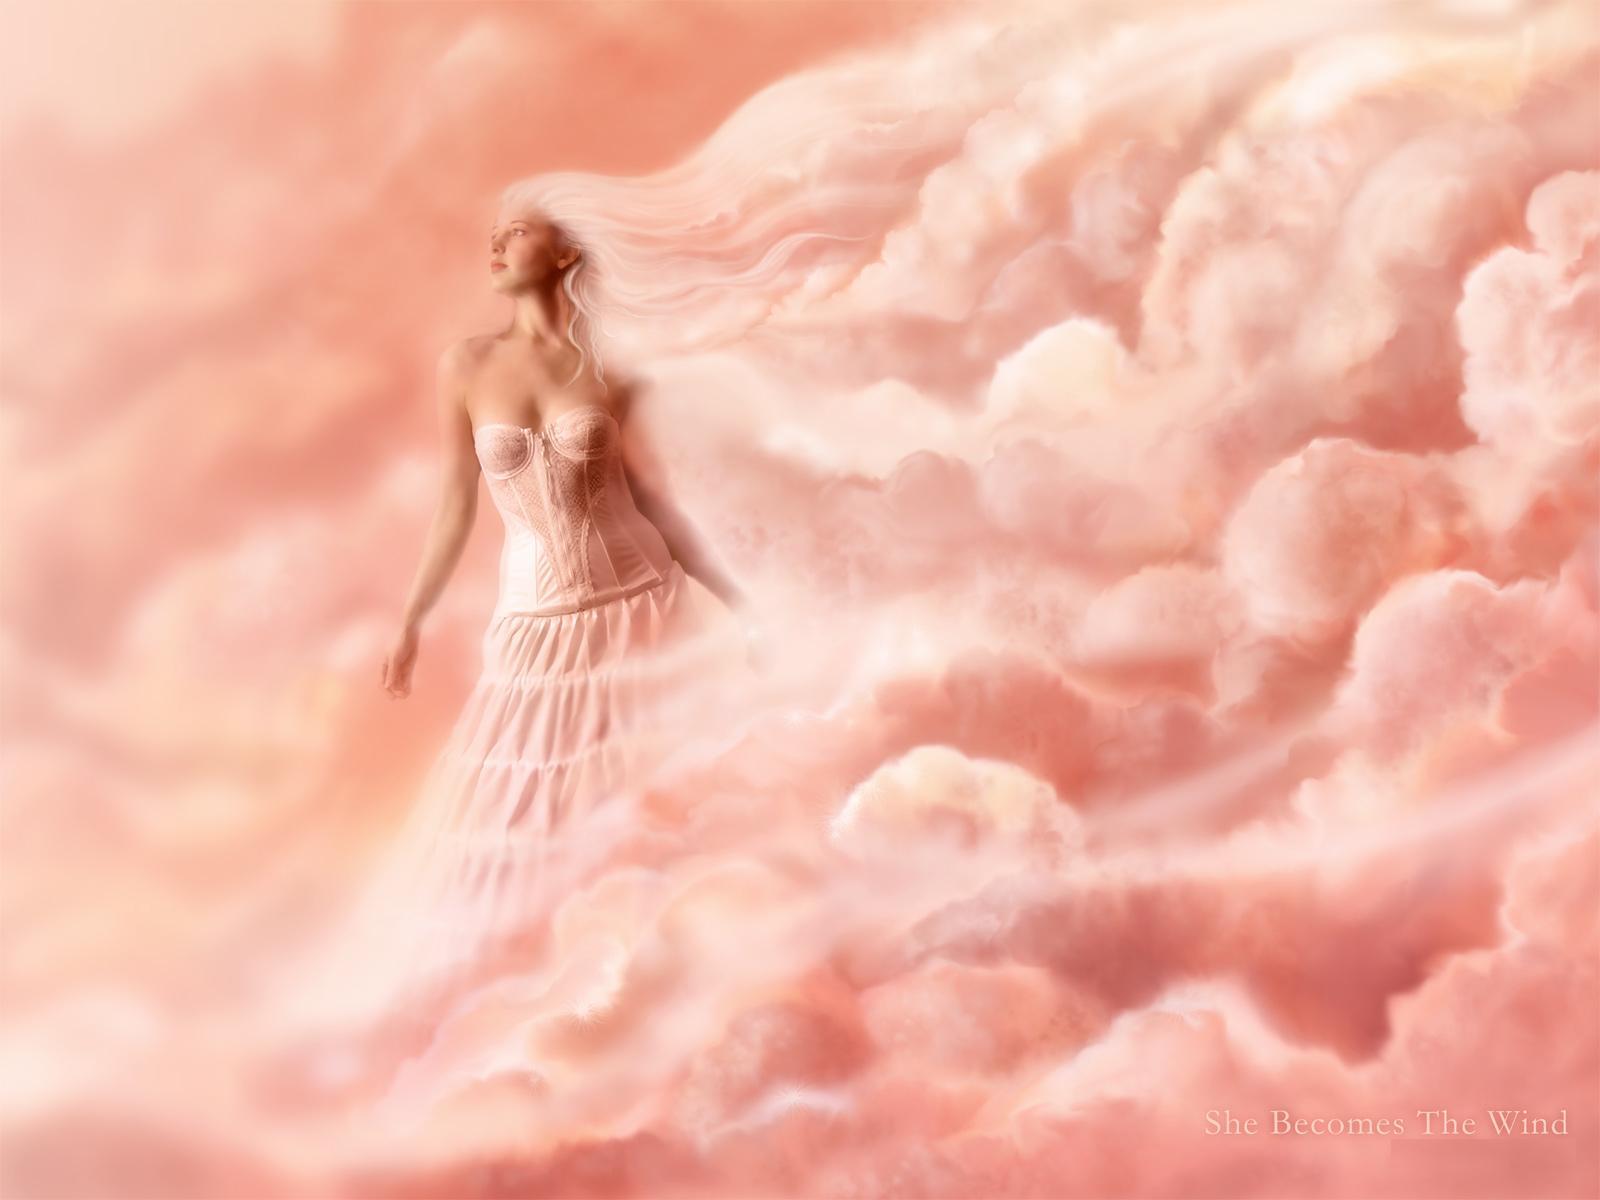 Фэнтези - Ангел  Goddess Woman Фэнтези Обои